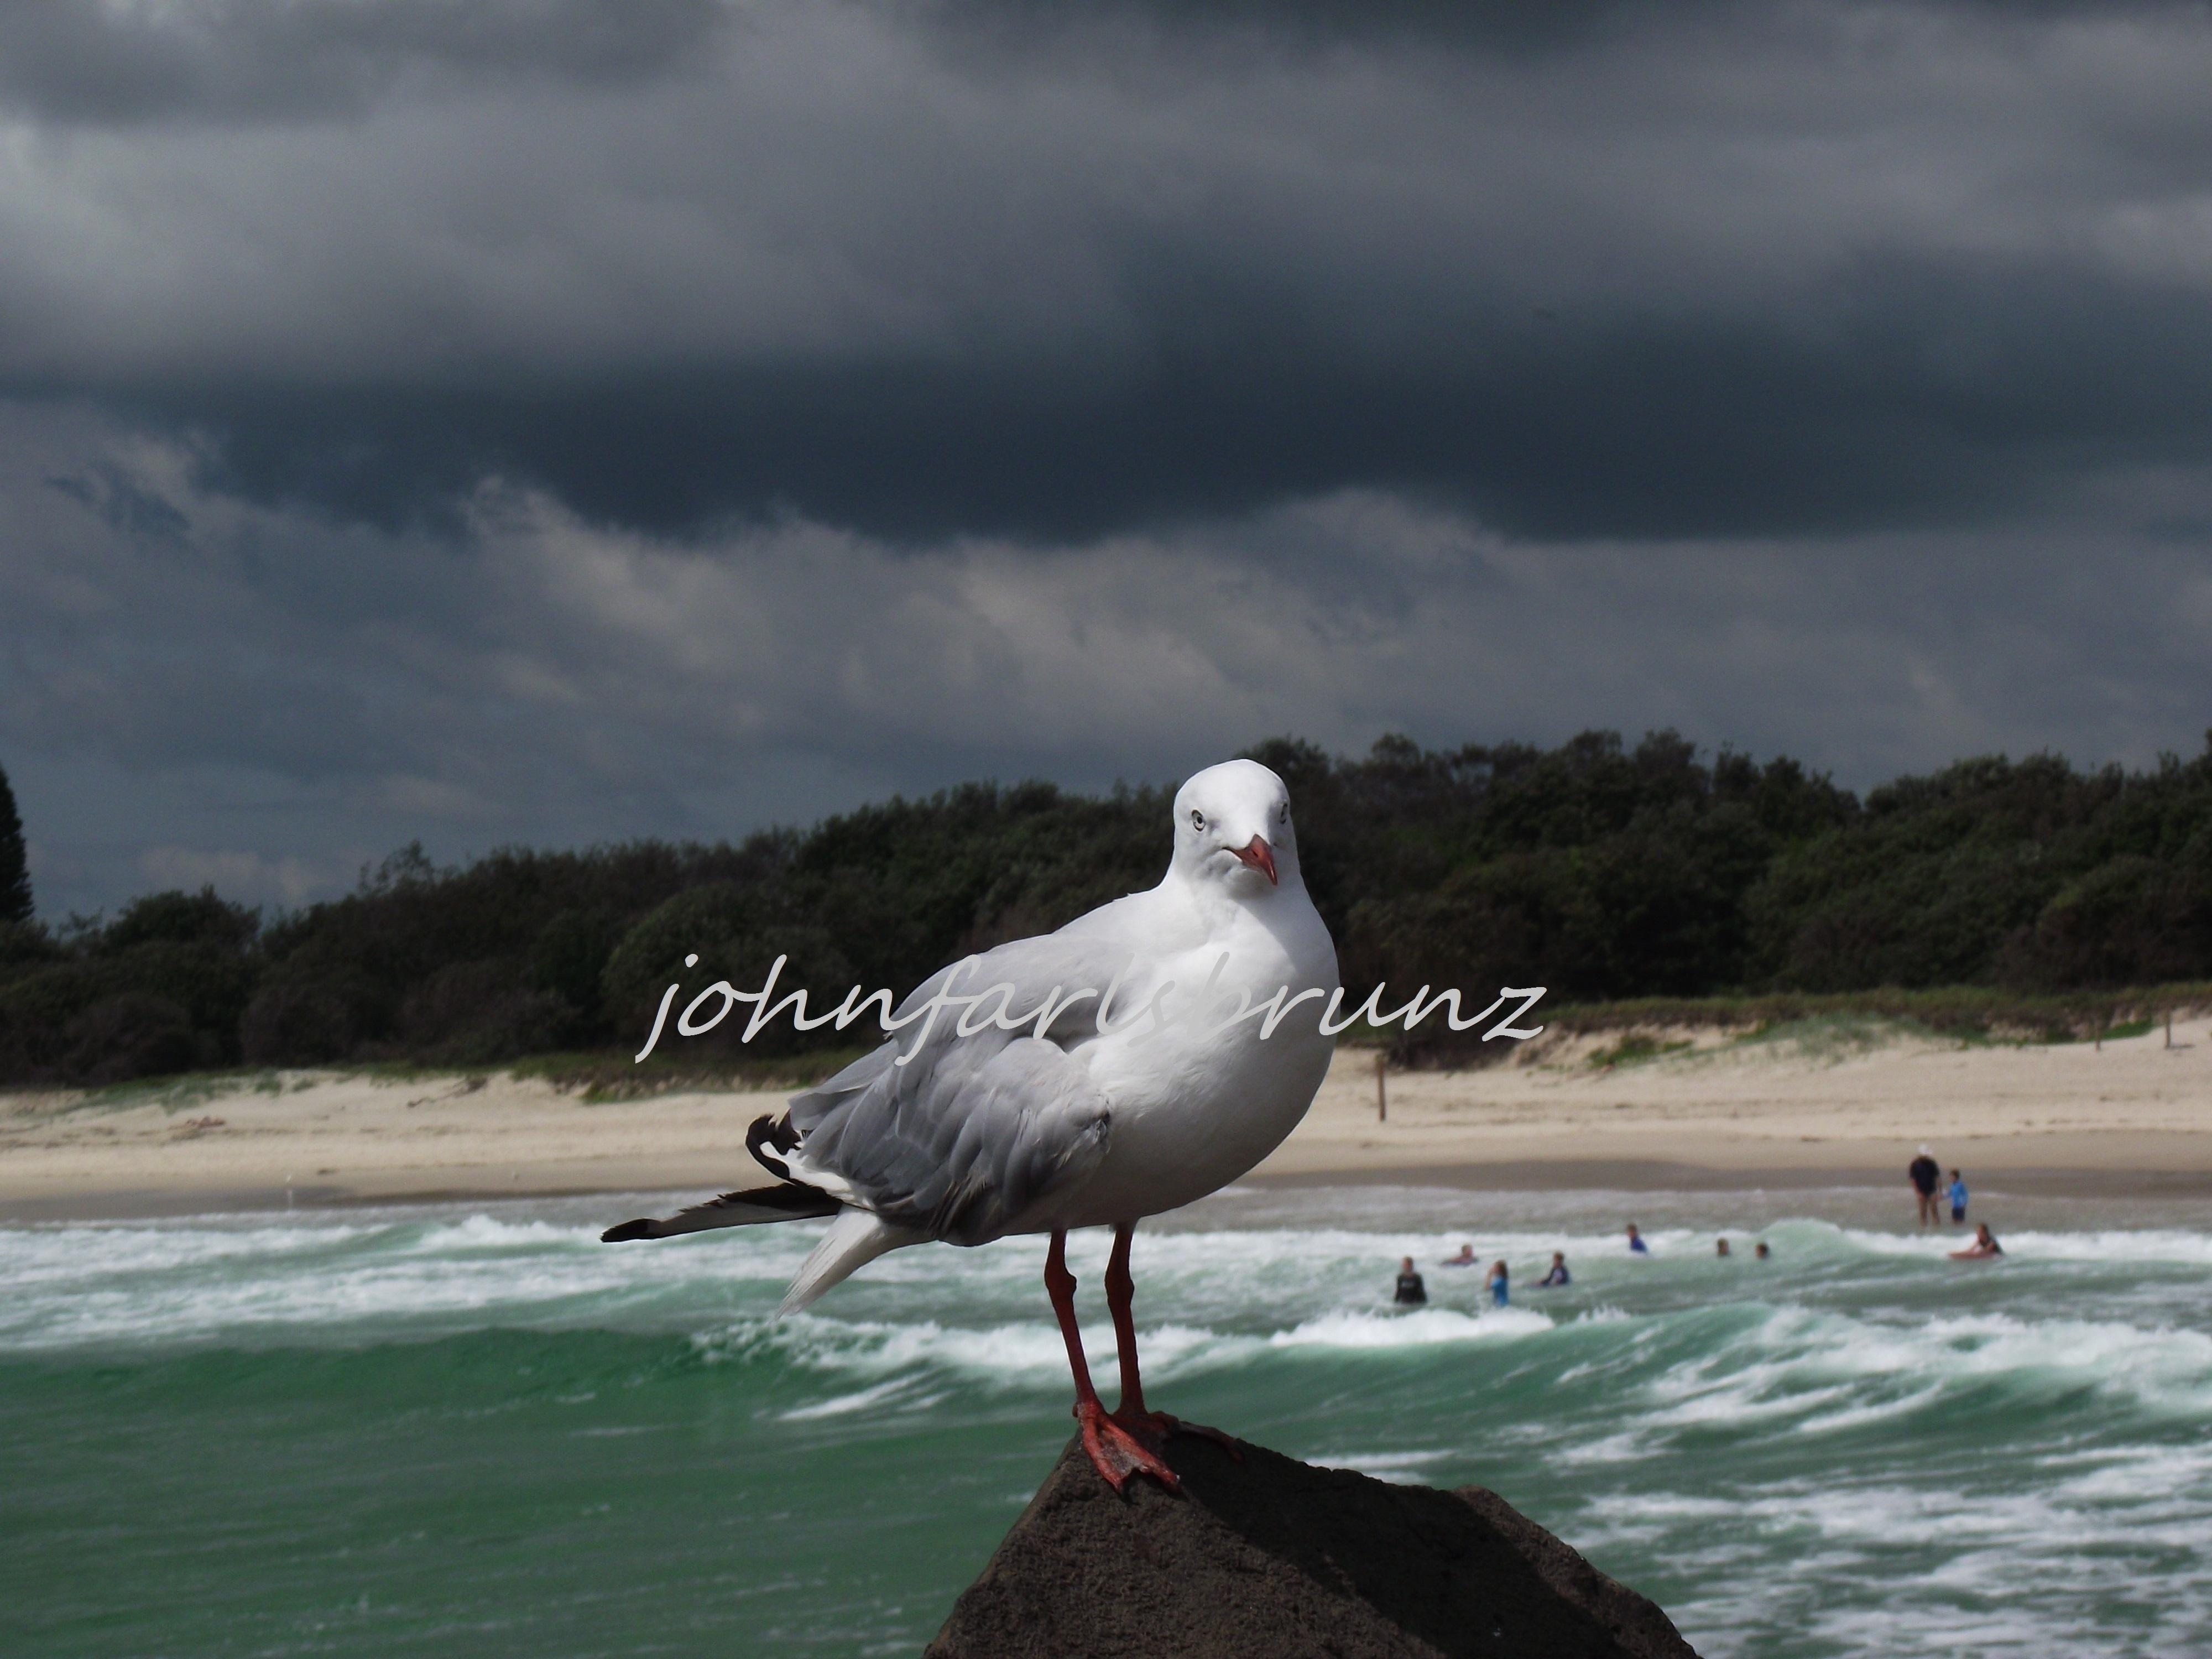 seagull floppy wing